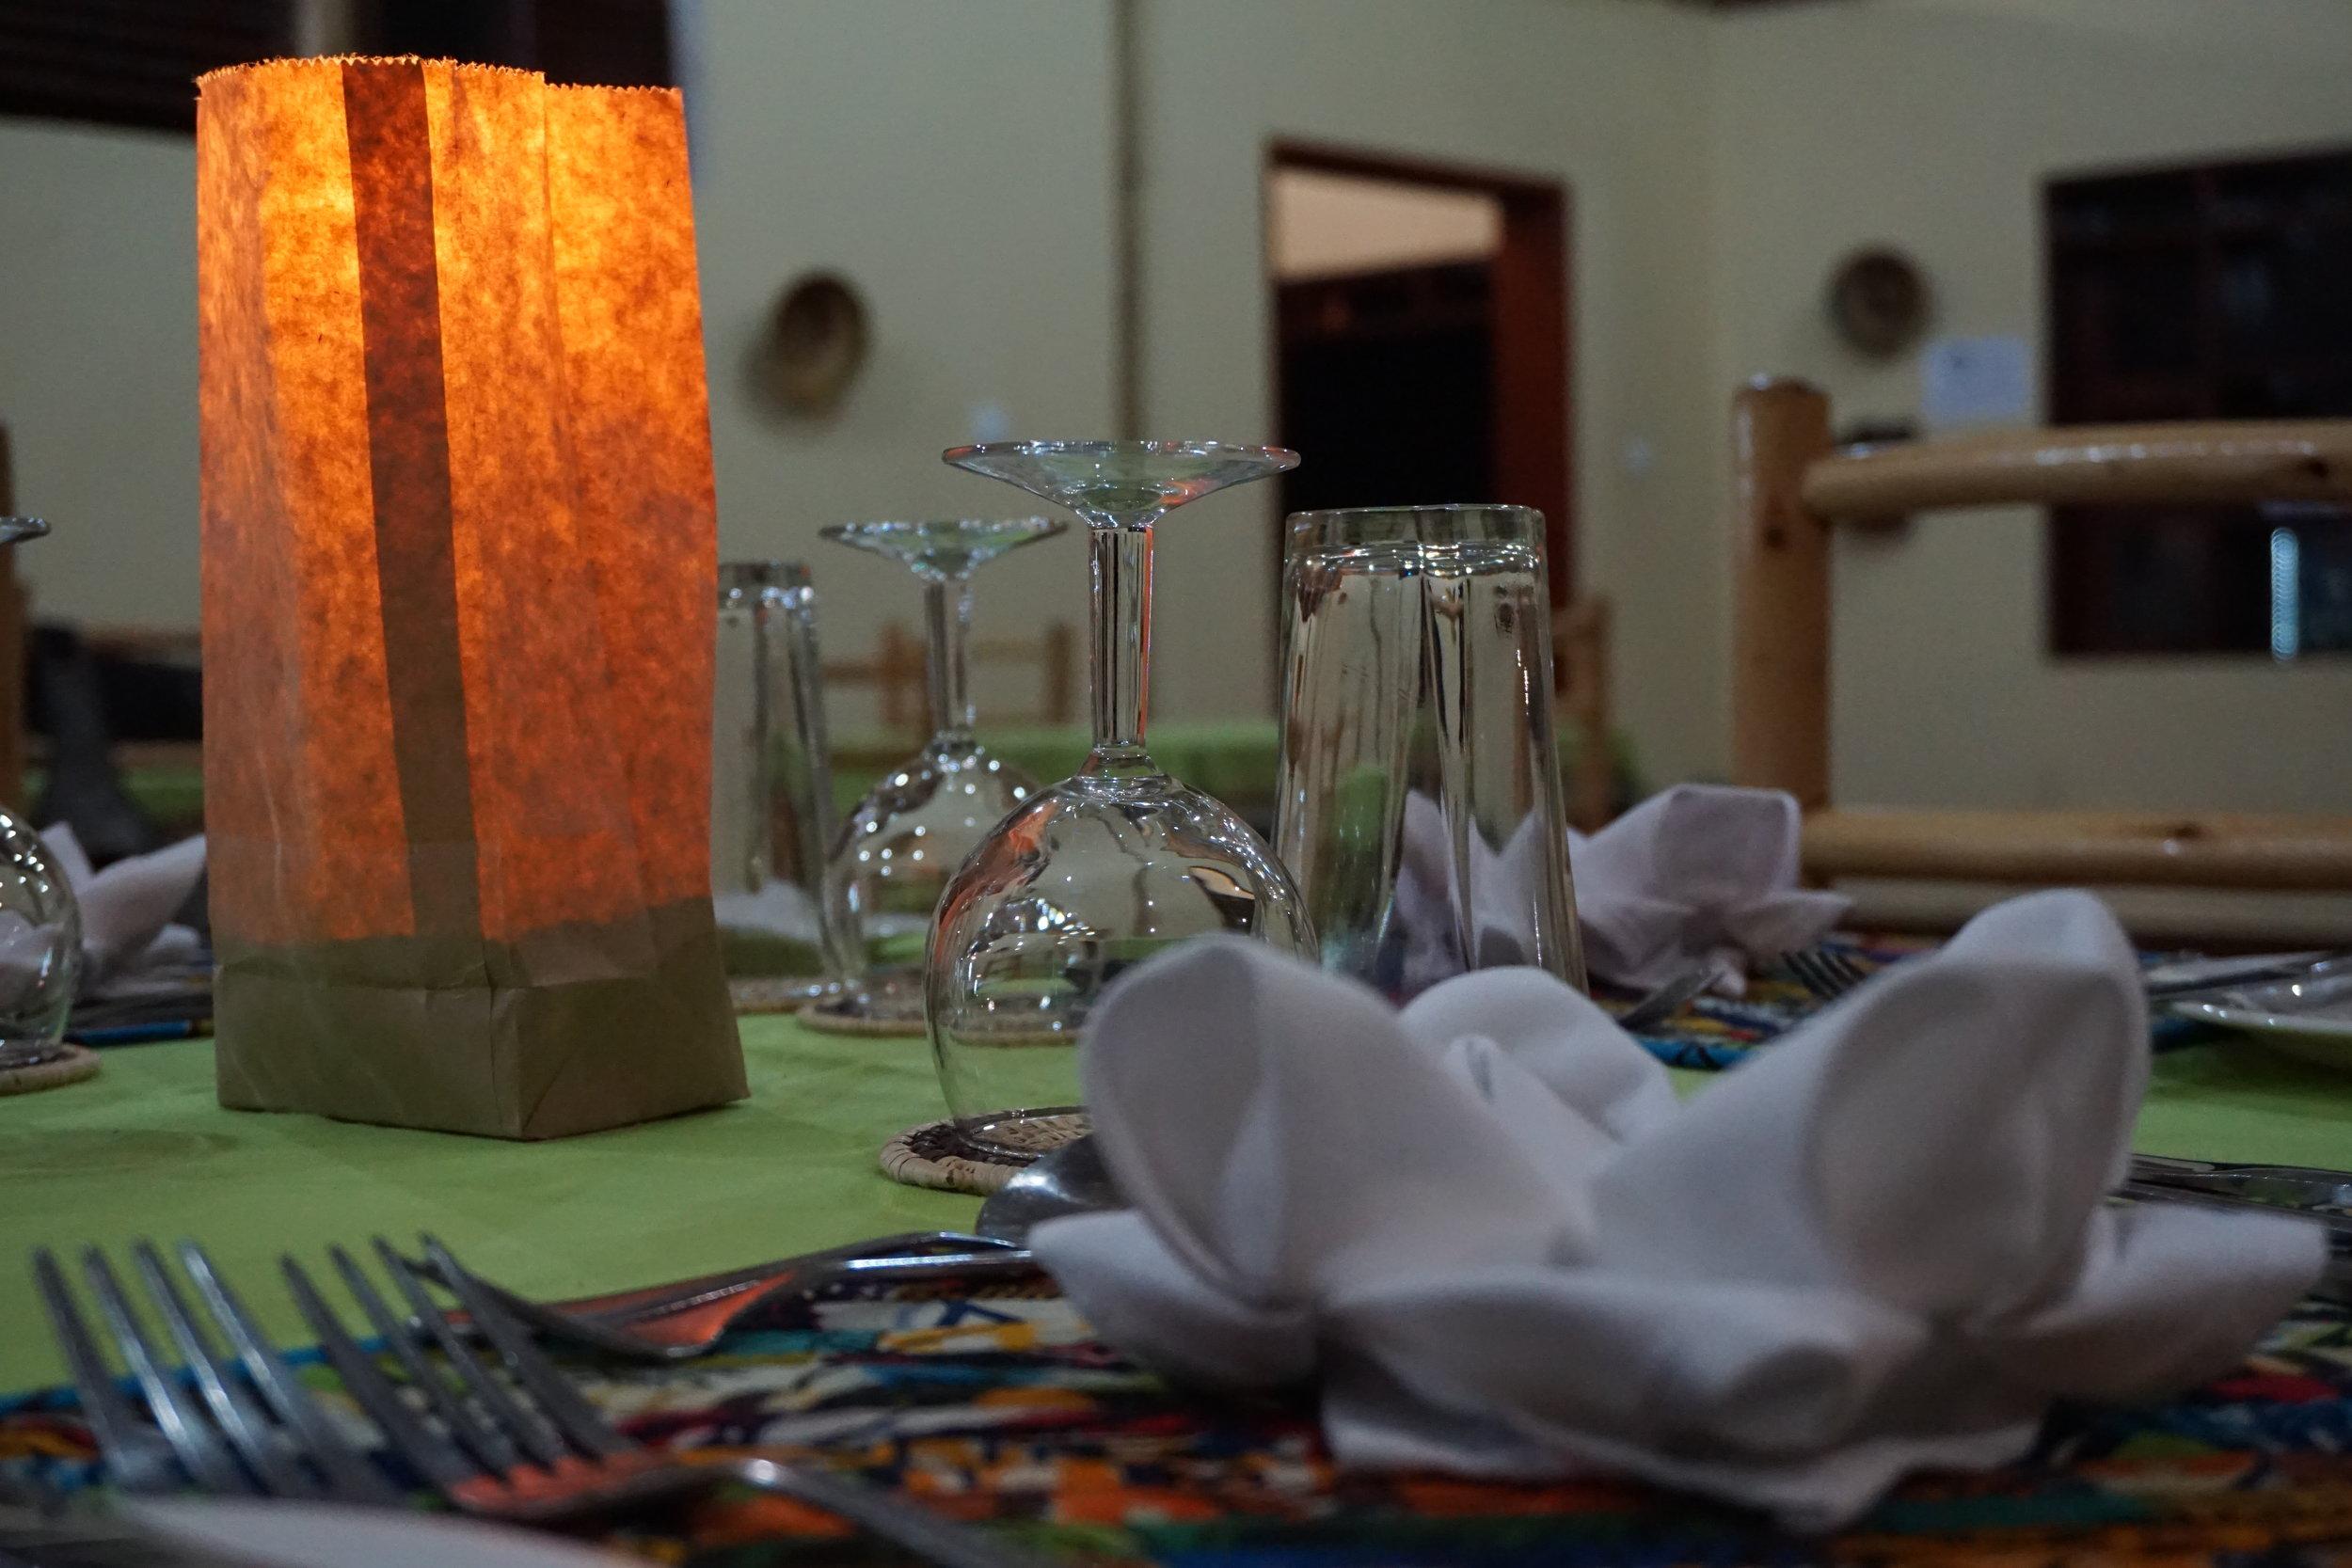 StaywithusRestaurant(3).JPG